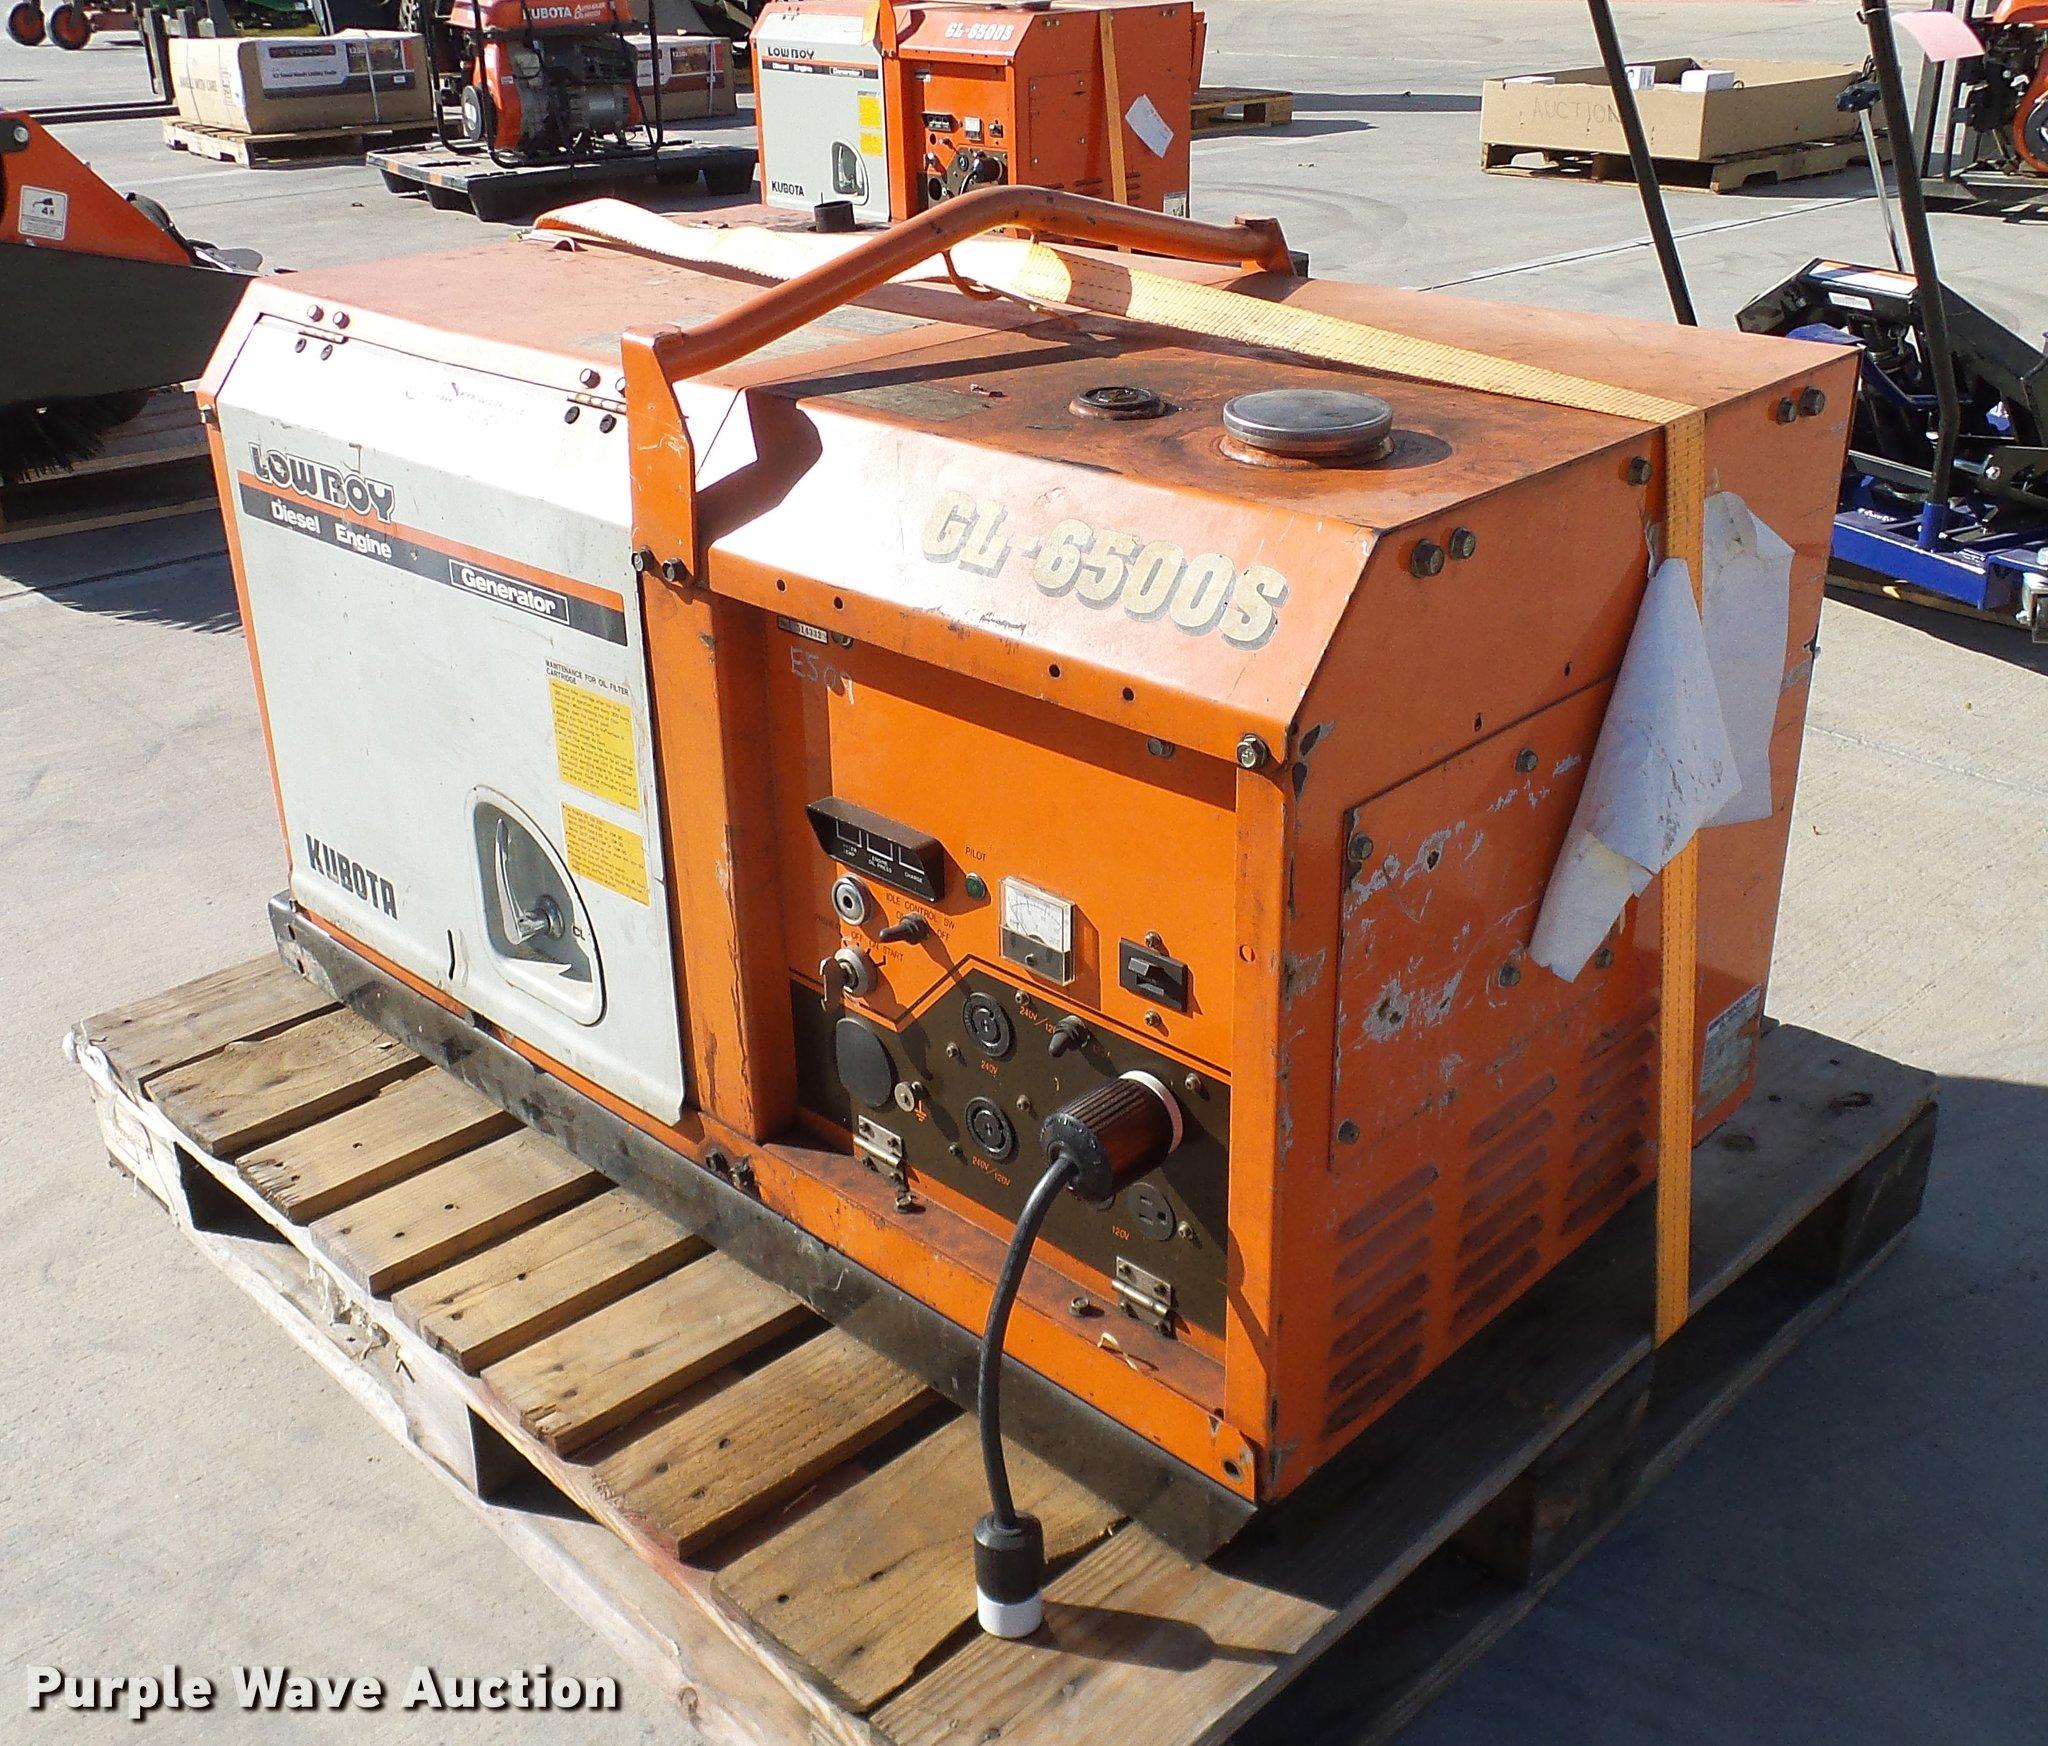 kubota gl6500s generator item az9296 sold! december 27 v kubota cooling system diagram az9296 image for item az9296 kubota gl6500s generator